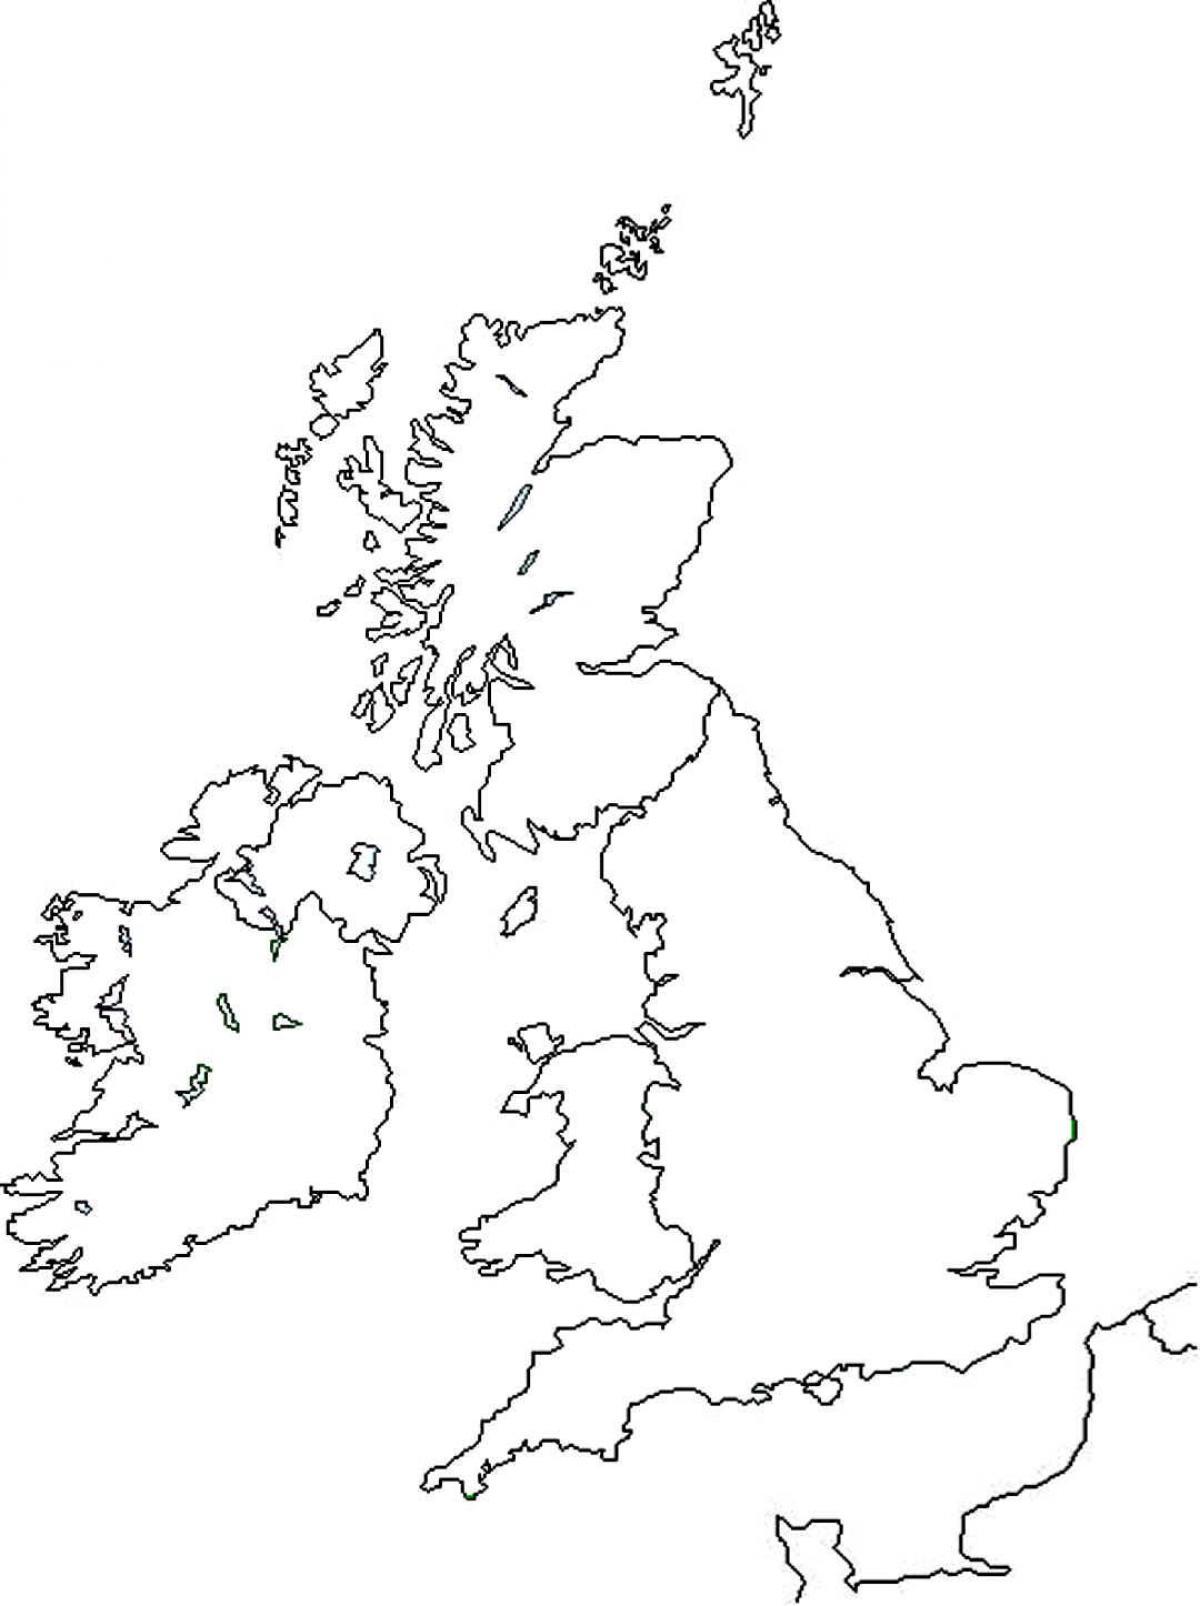 Slepa Mapa Velke Britanie Mapa Britanie Prazdne Severni Evropa